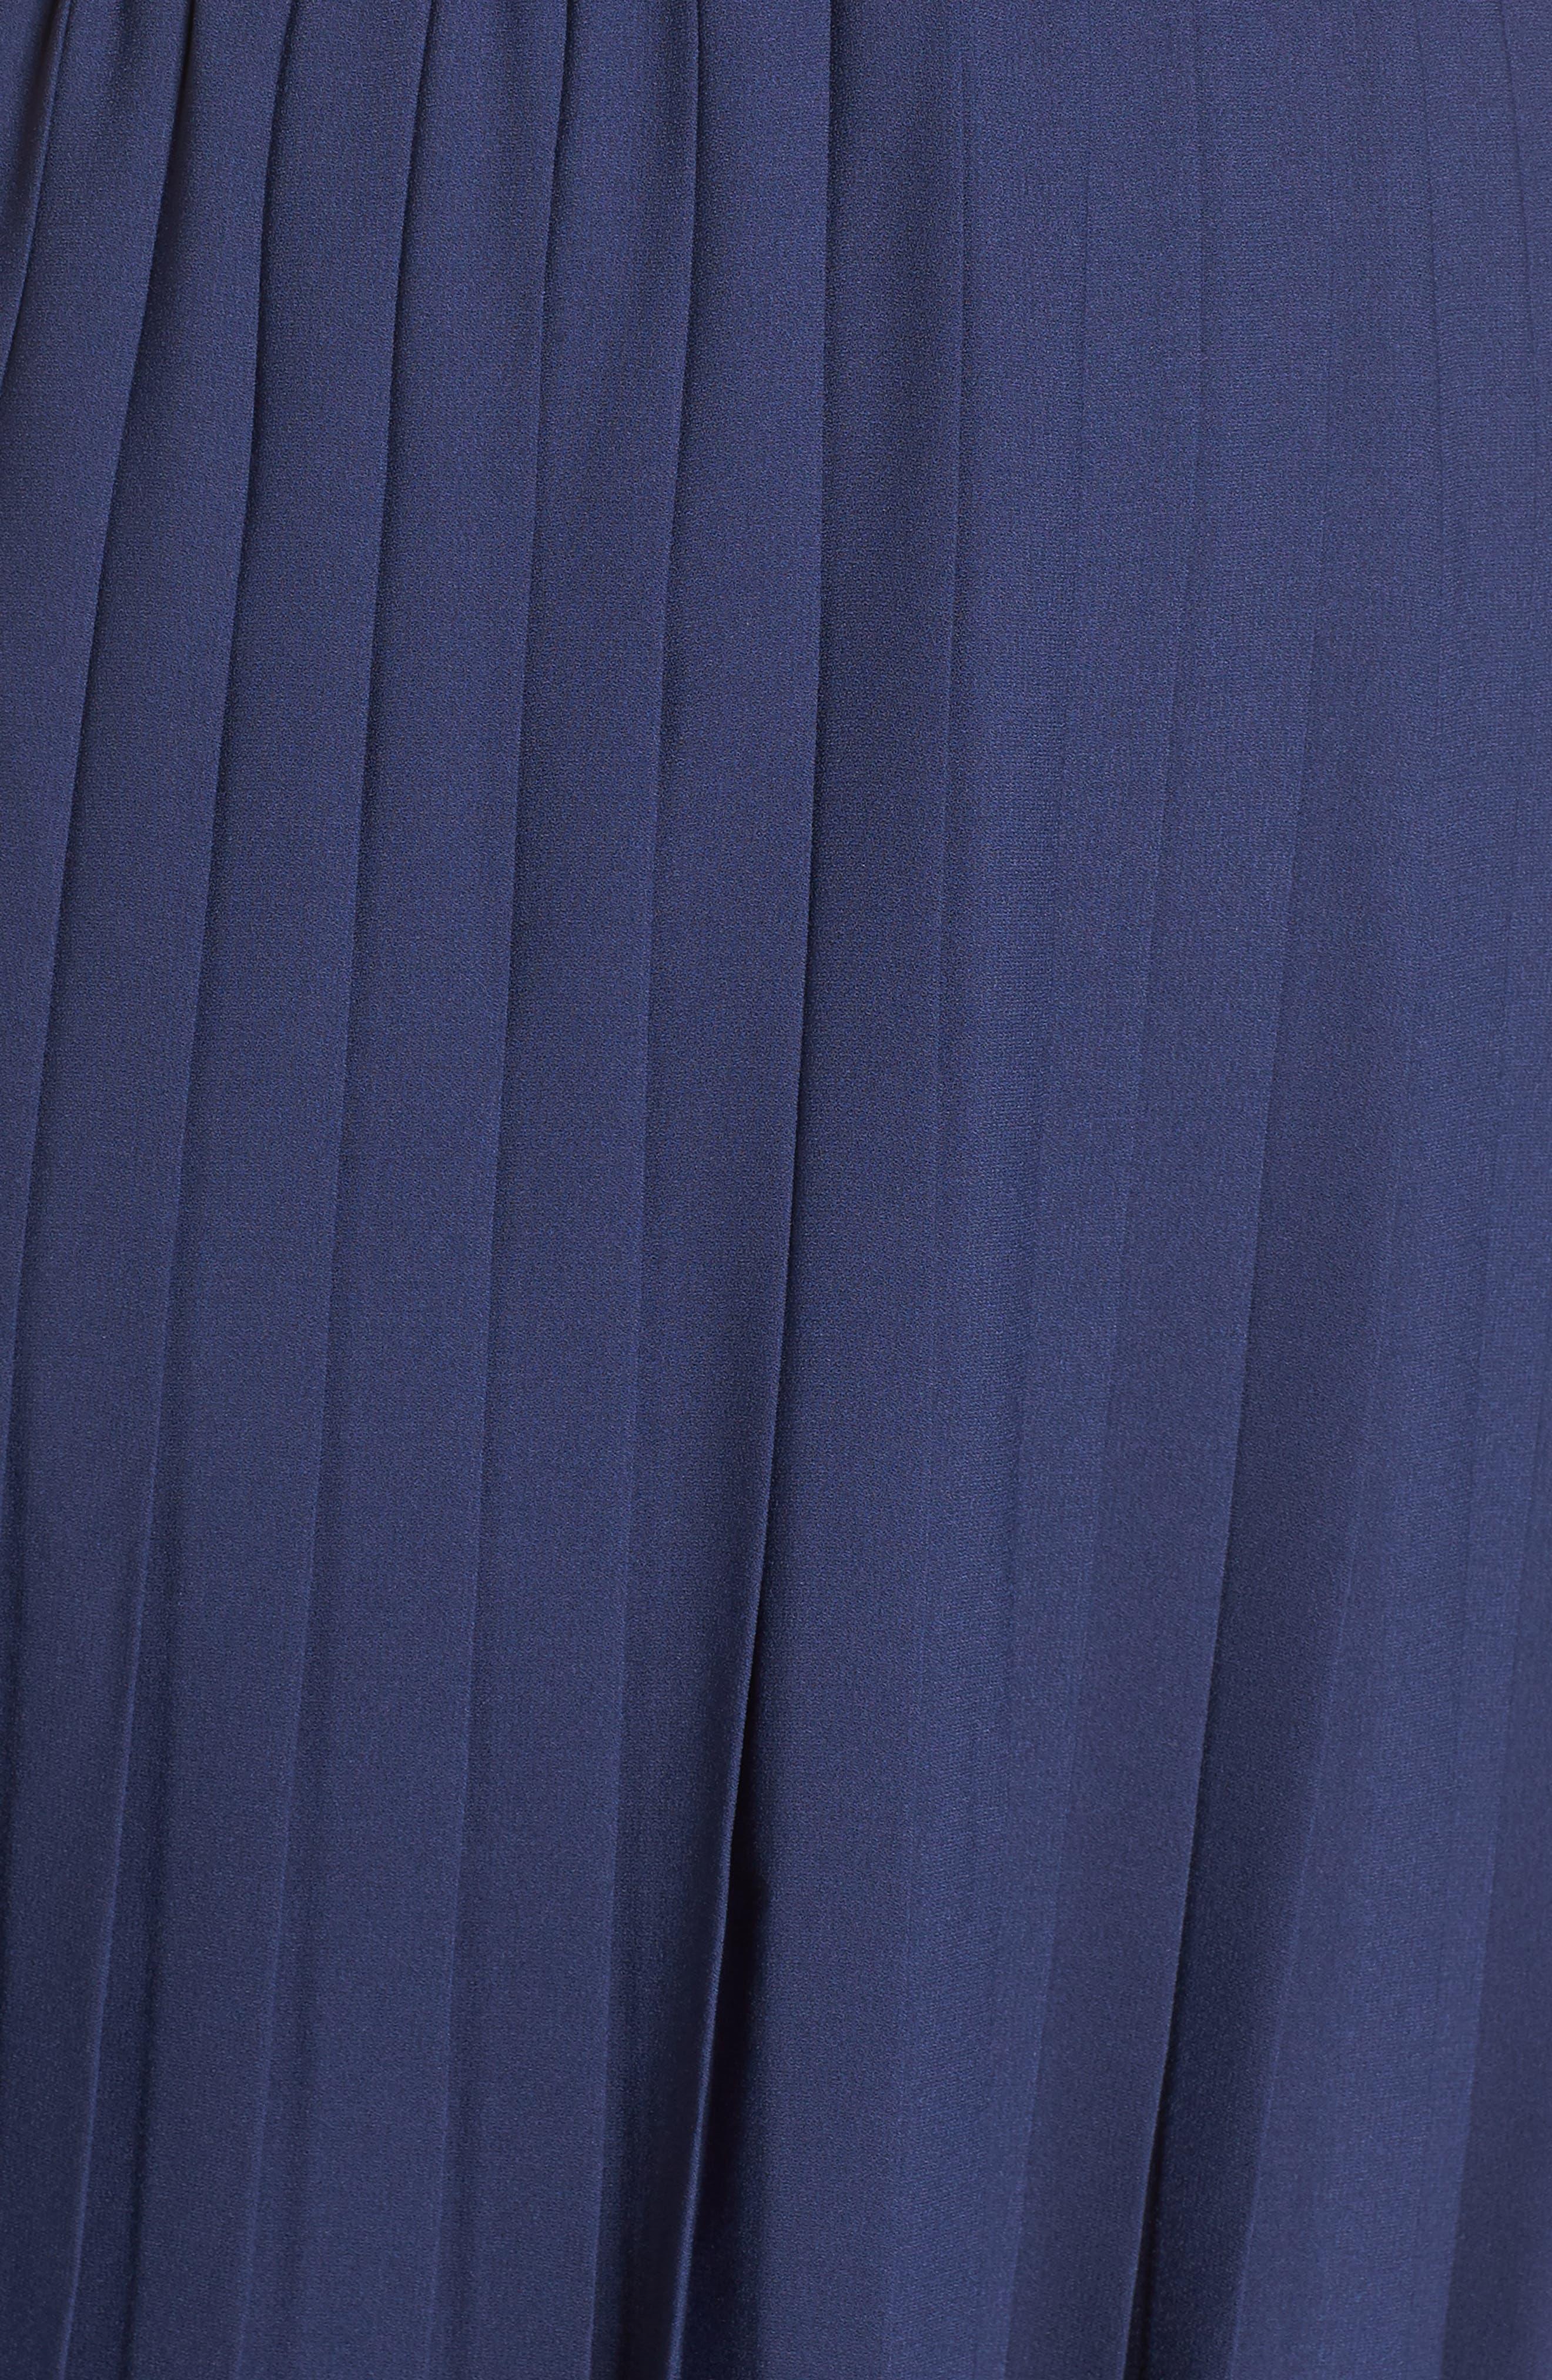 LEITH,                             Pleated Surplice Dress,                             Alternate thumbnail 12, color,                             NAVY PEACOAT